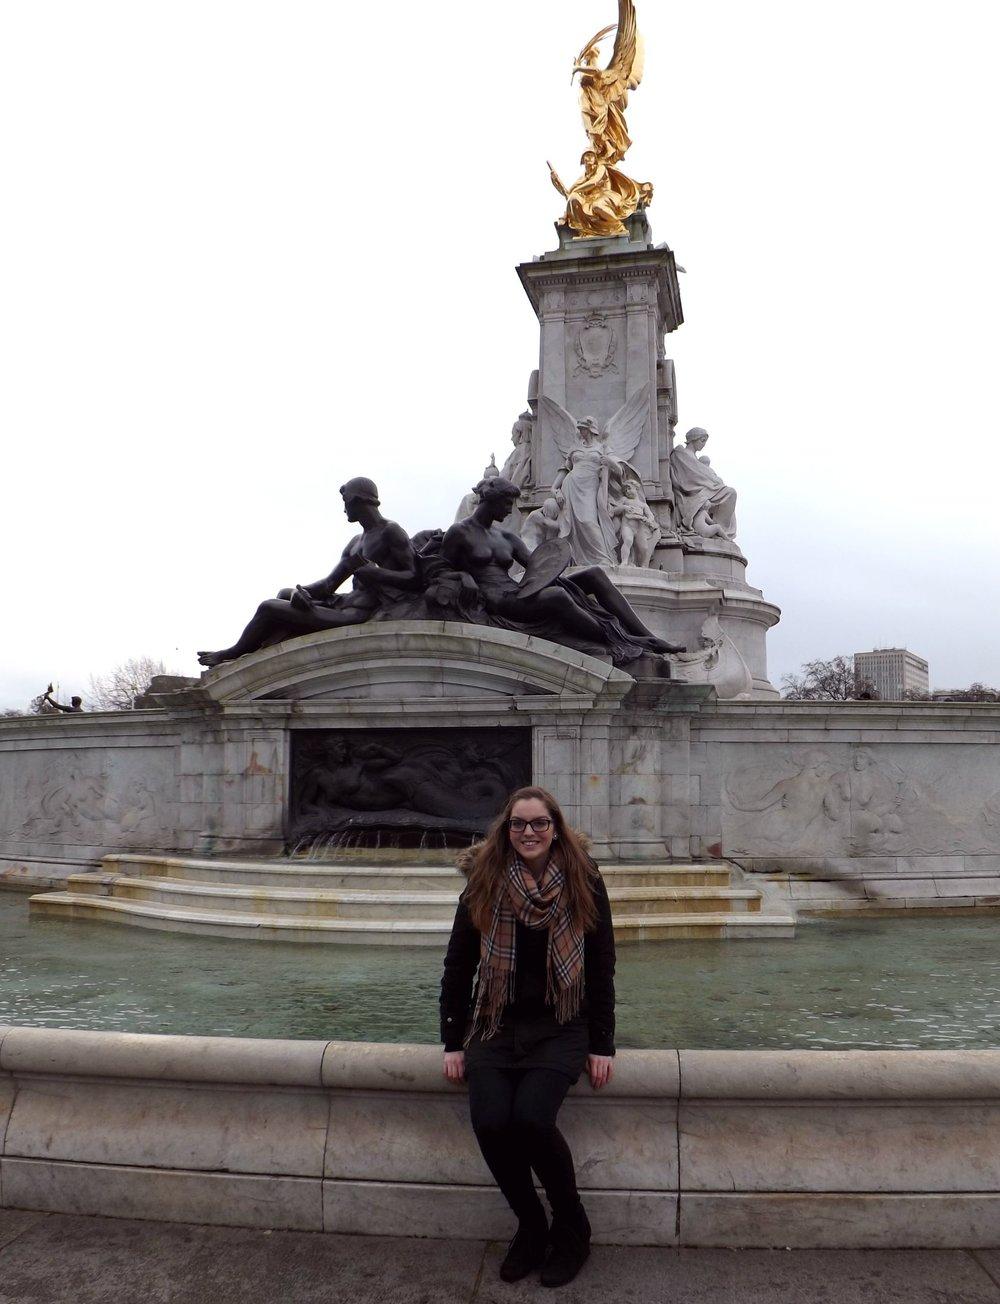 Kaitlyn at the London Fountain | Tall Girl Meets World